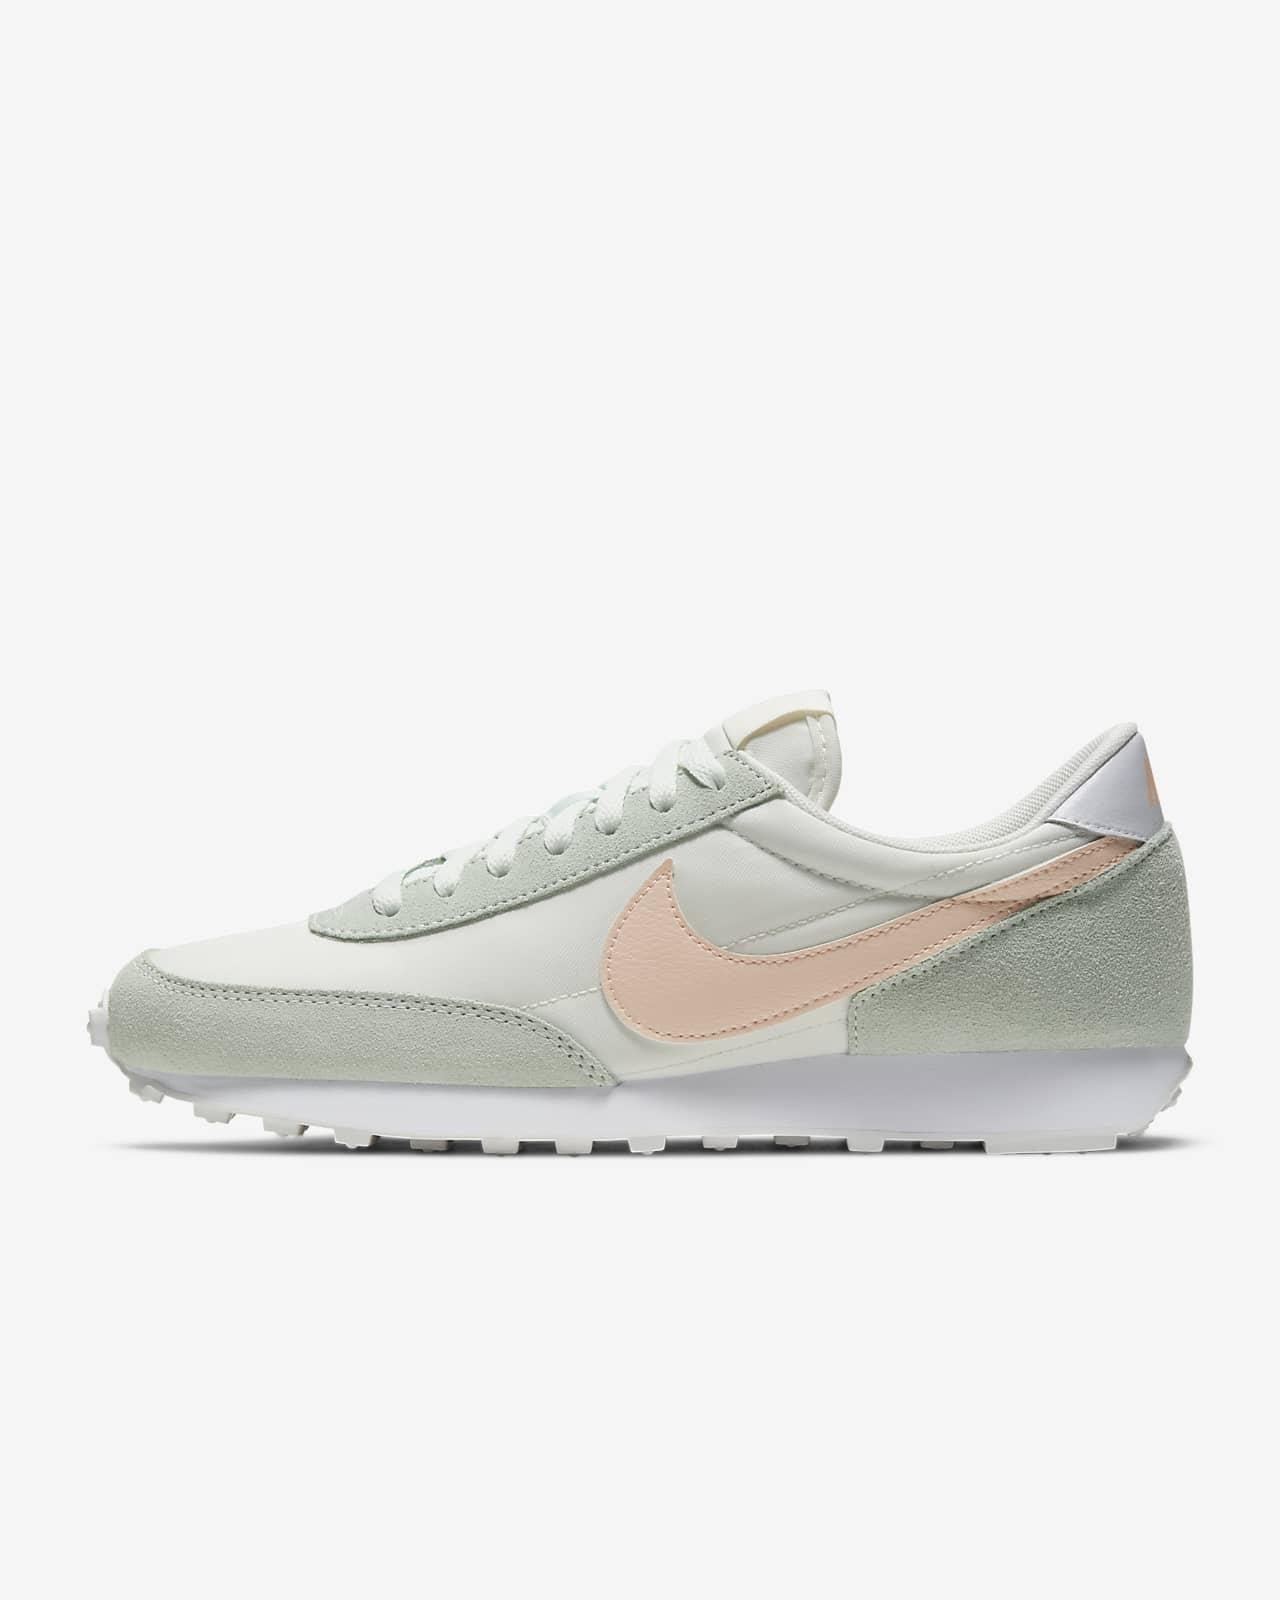 Chaussure Nike Daybreak pour Femme. Nike LU